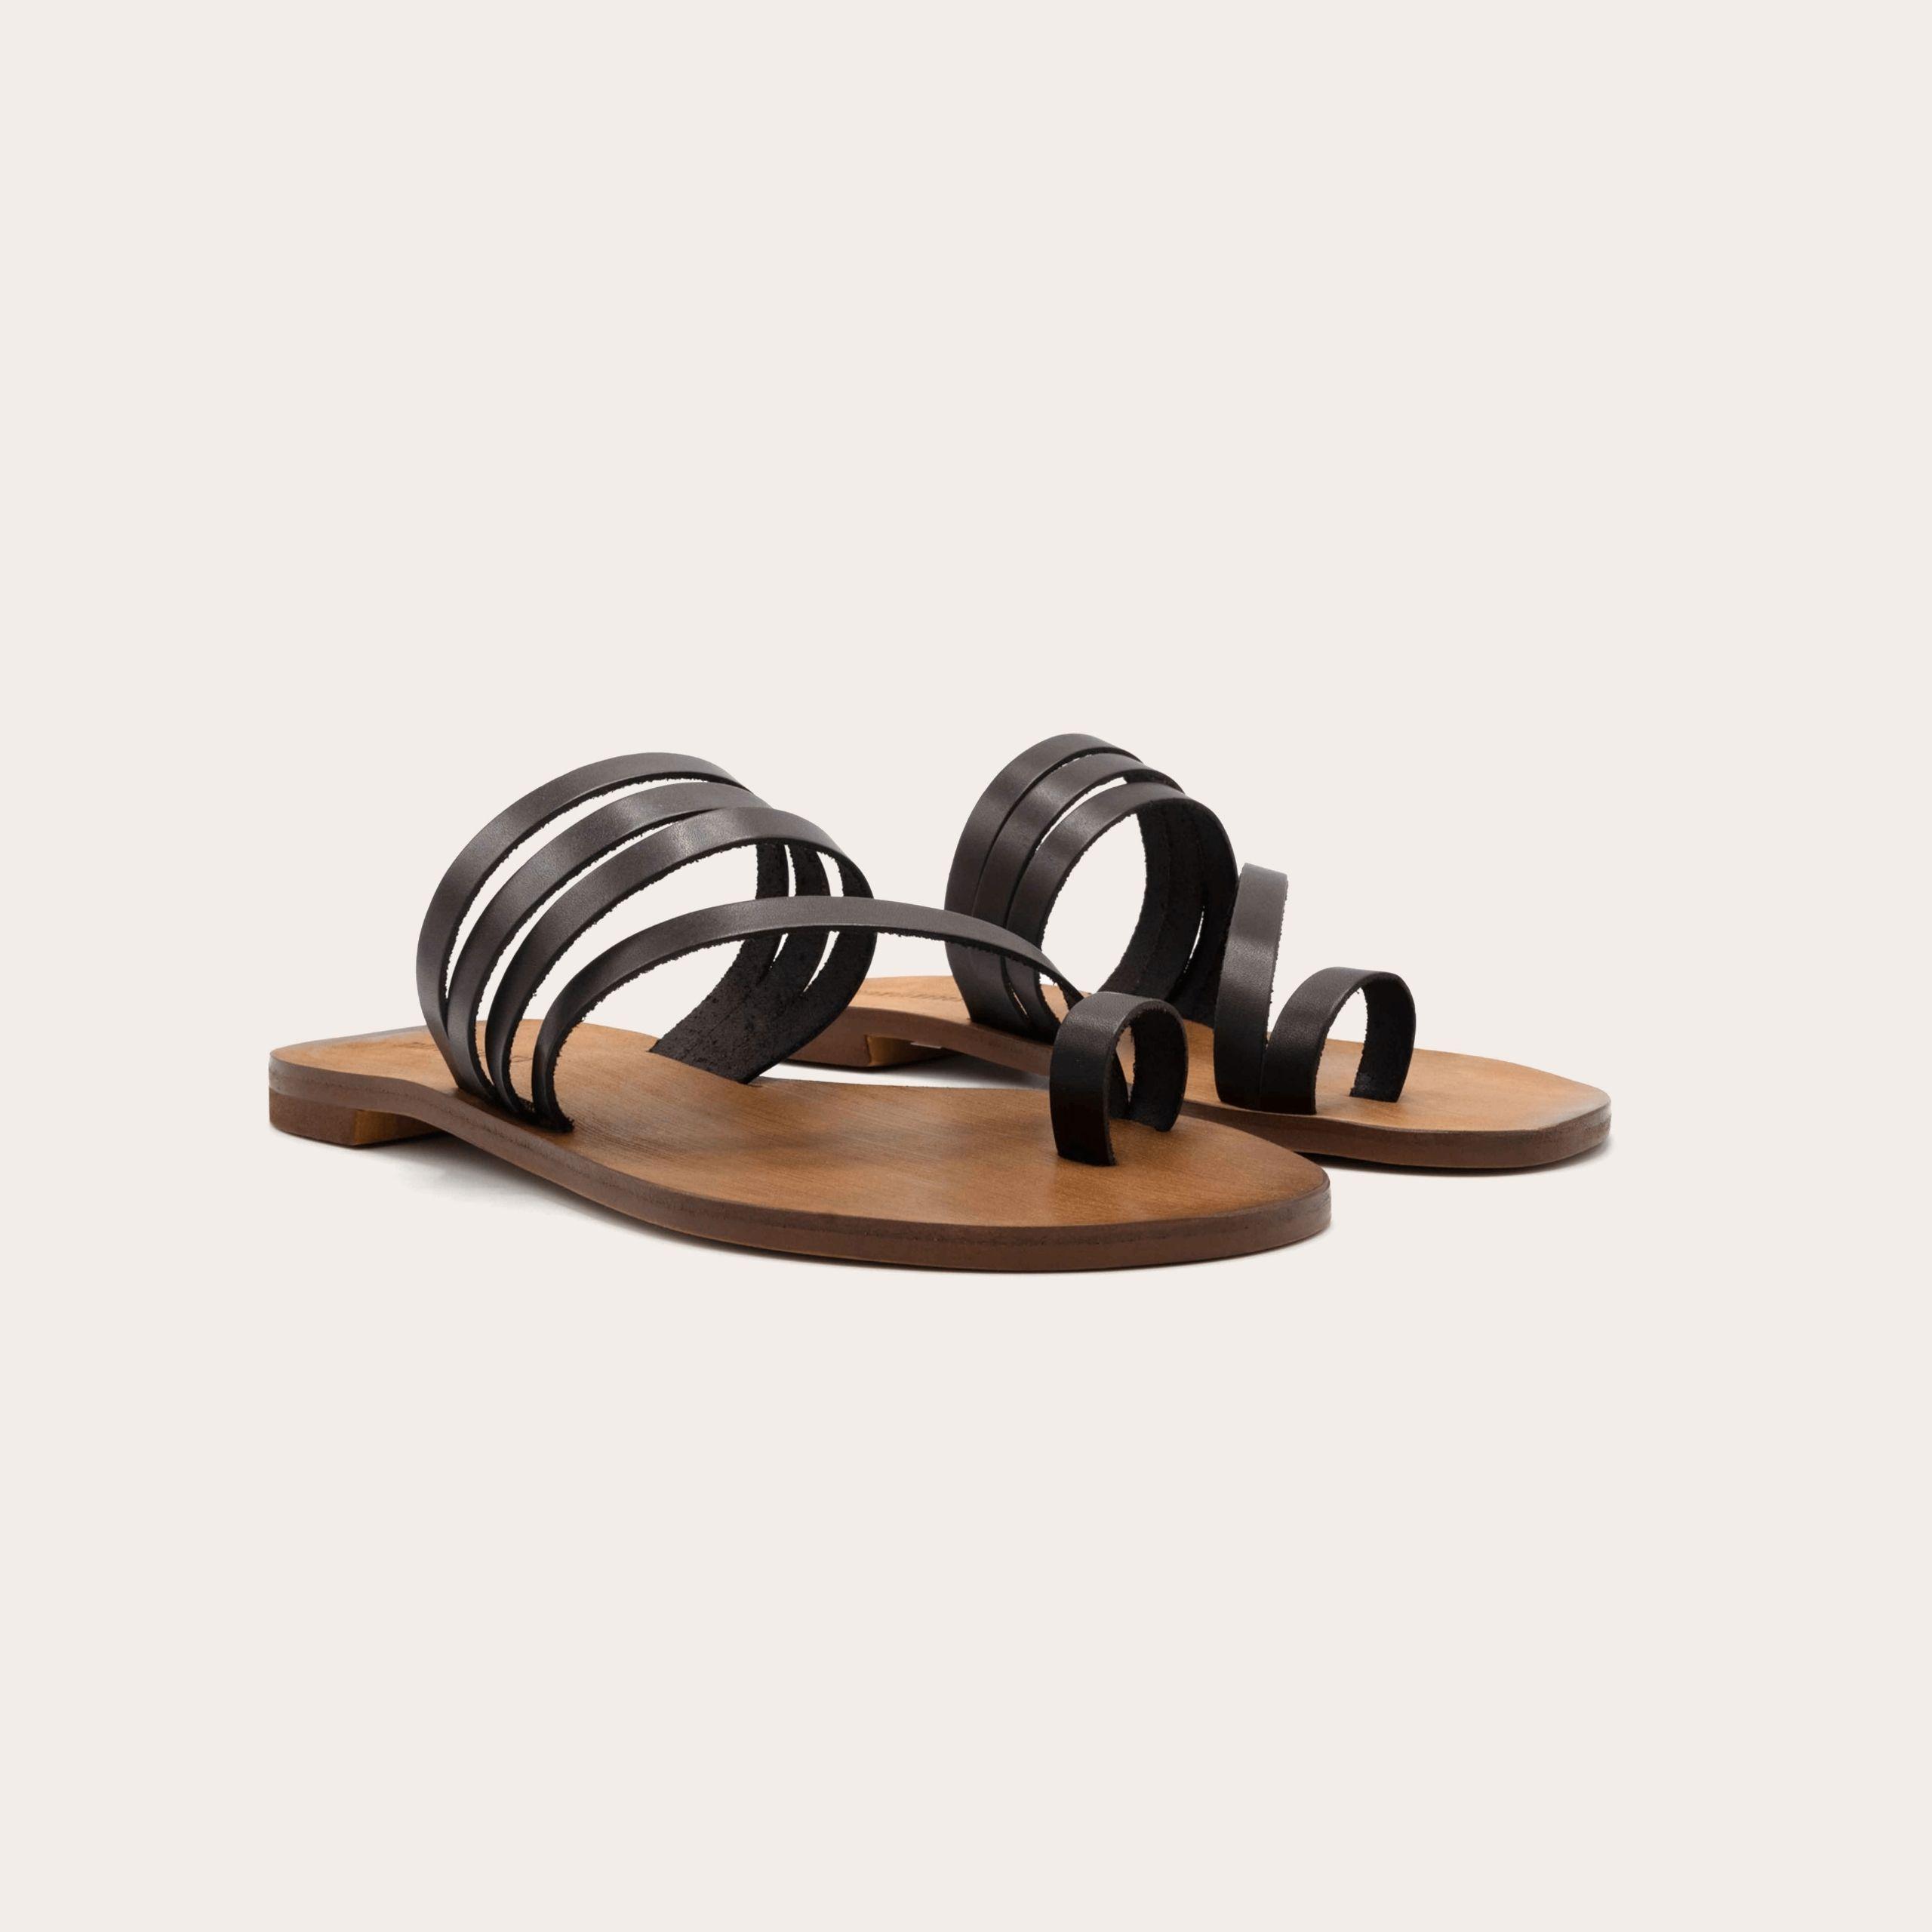 xico-brown_2_lintsandalen sandals travelsandals vegan sustainable sandals wikkelsandalen